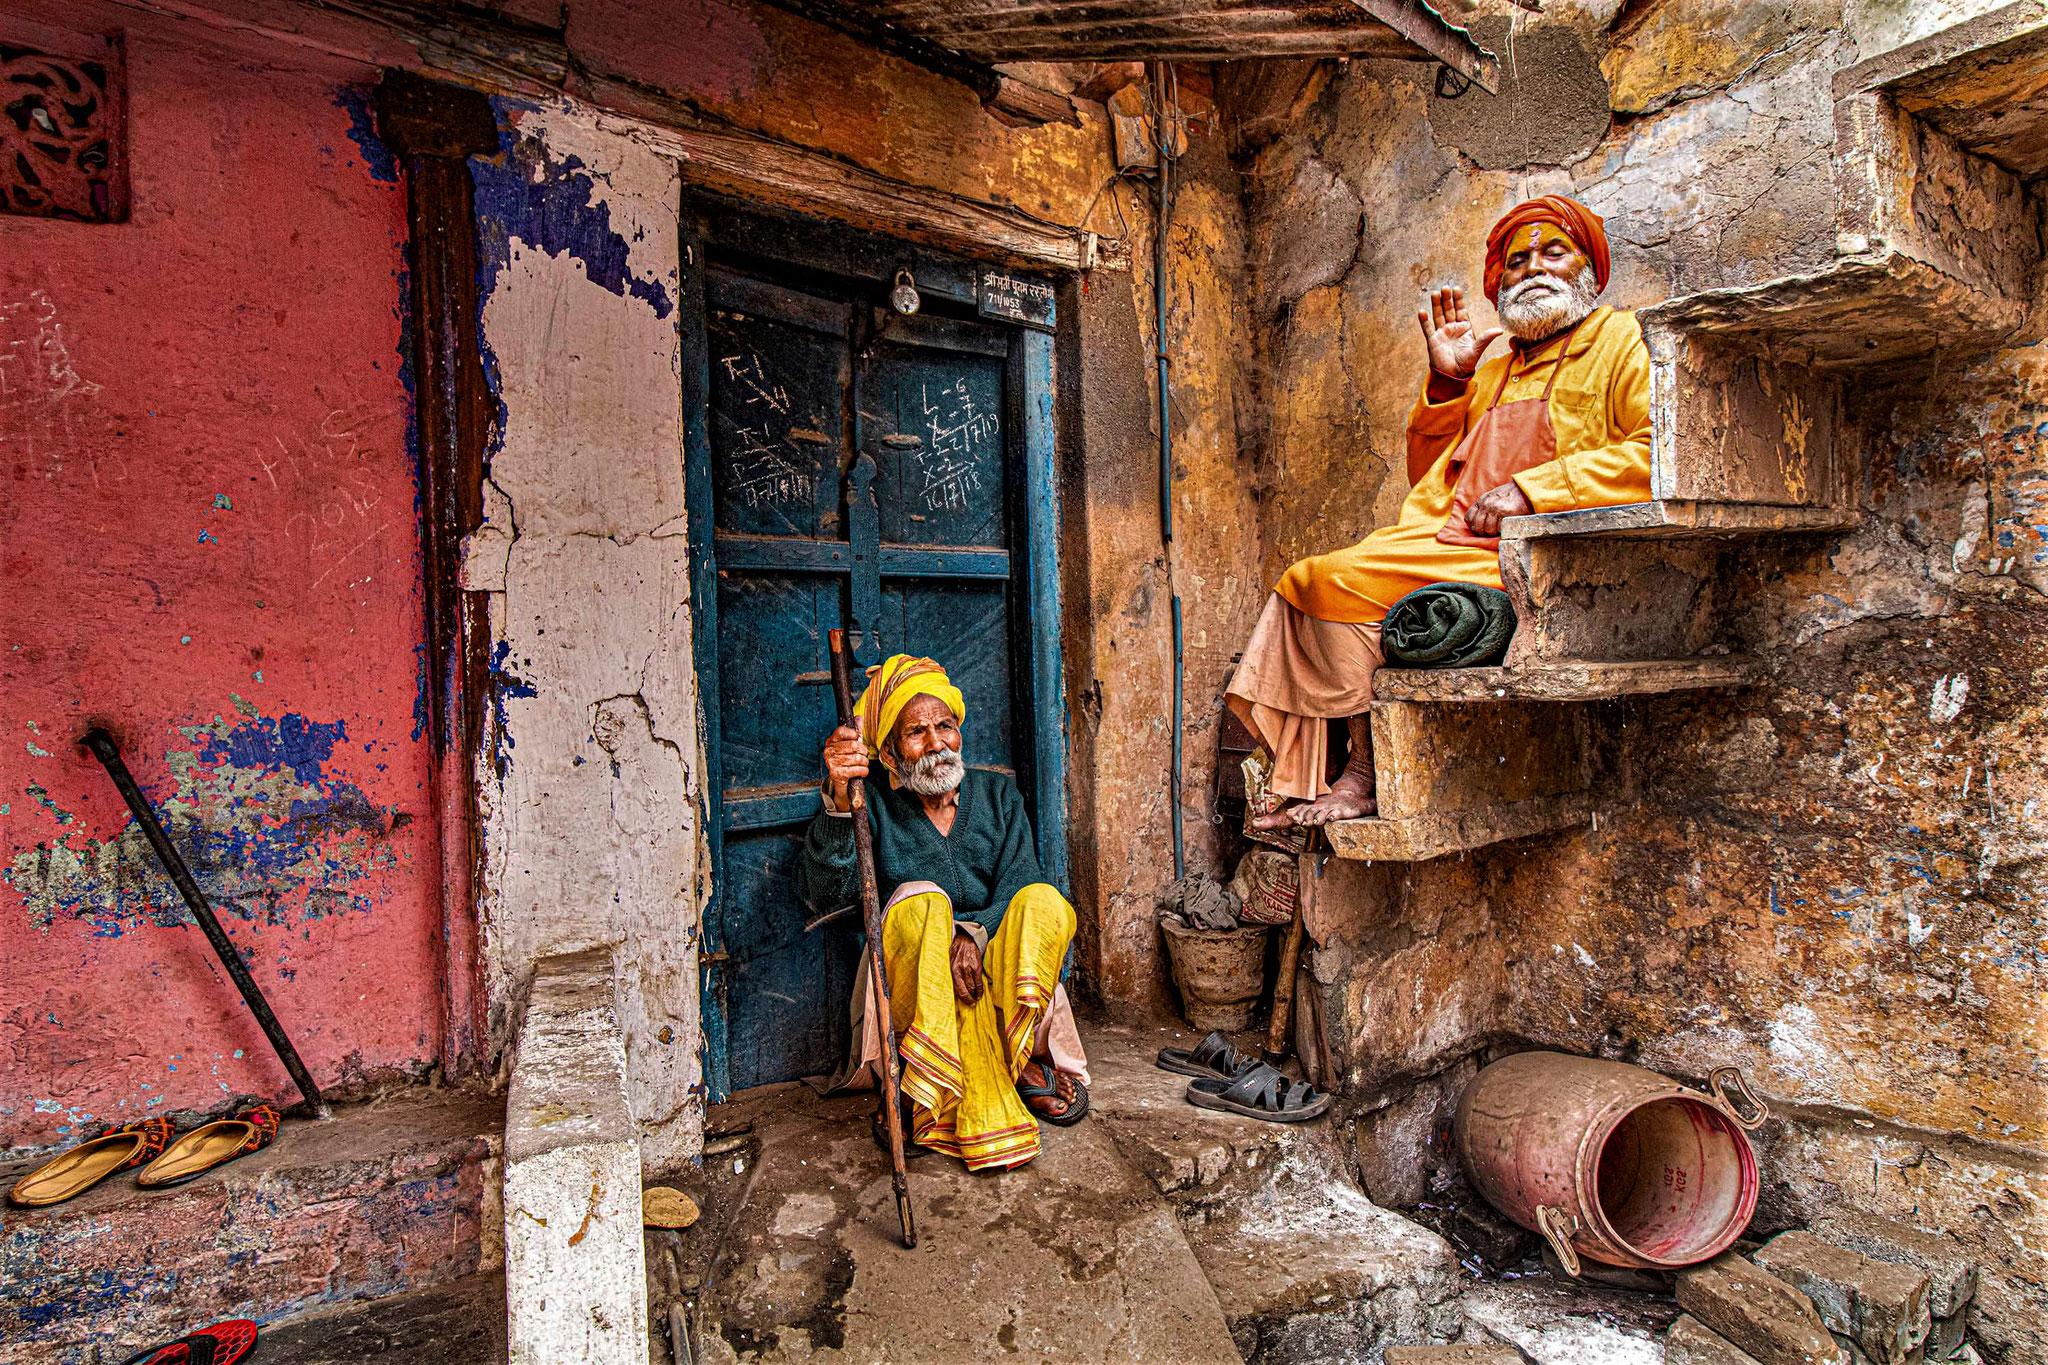 ubhra  Roychowdhury EFIAP (India)  - Old and wise